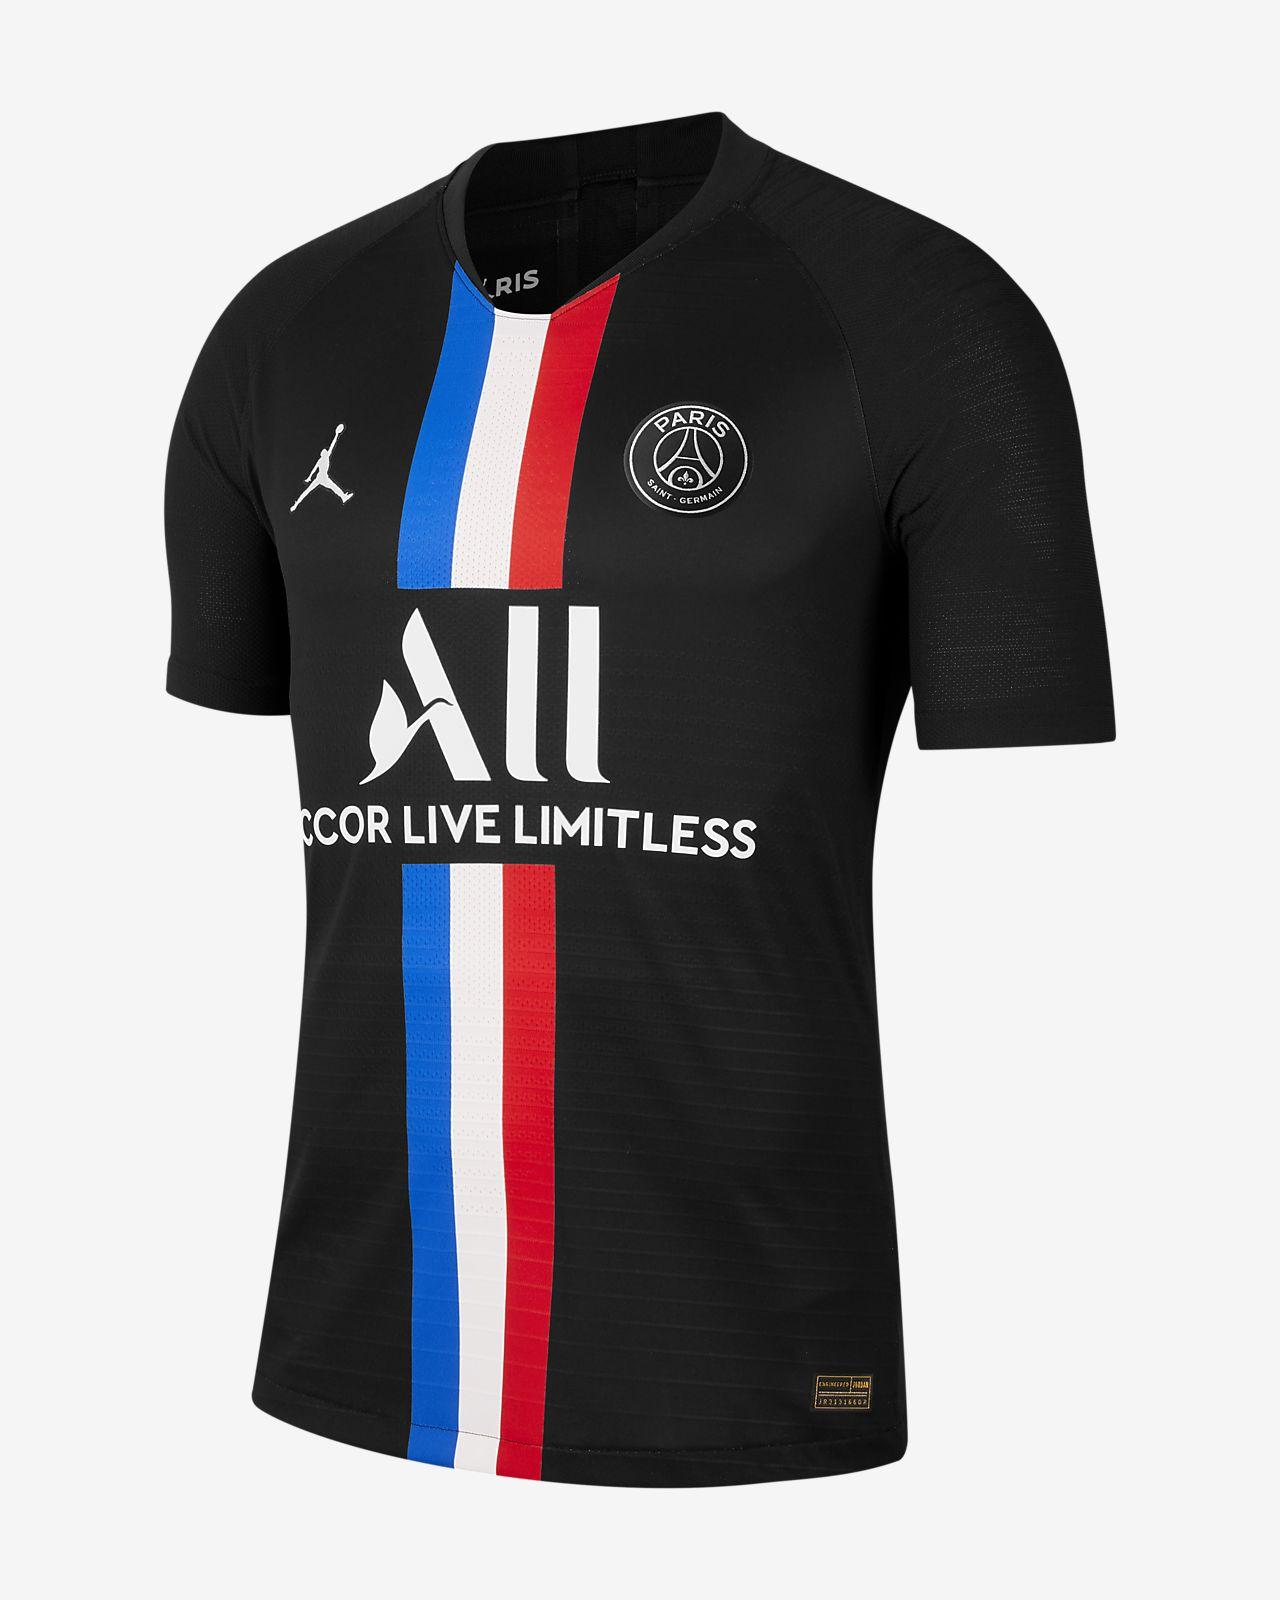 Jordan x Paris Saint-Germain 2019/20 Vapor Match Fourth Erkek Futbol Forması